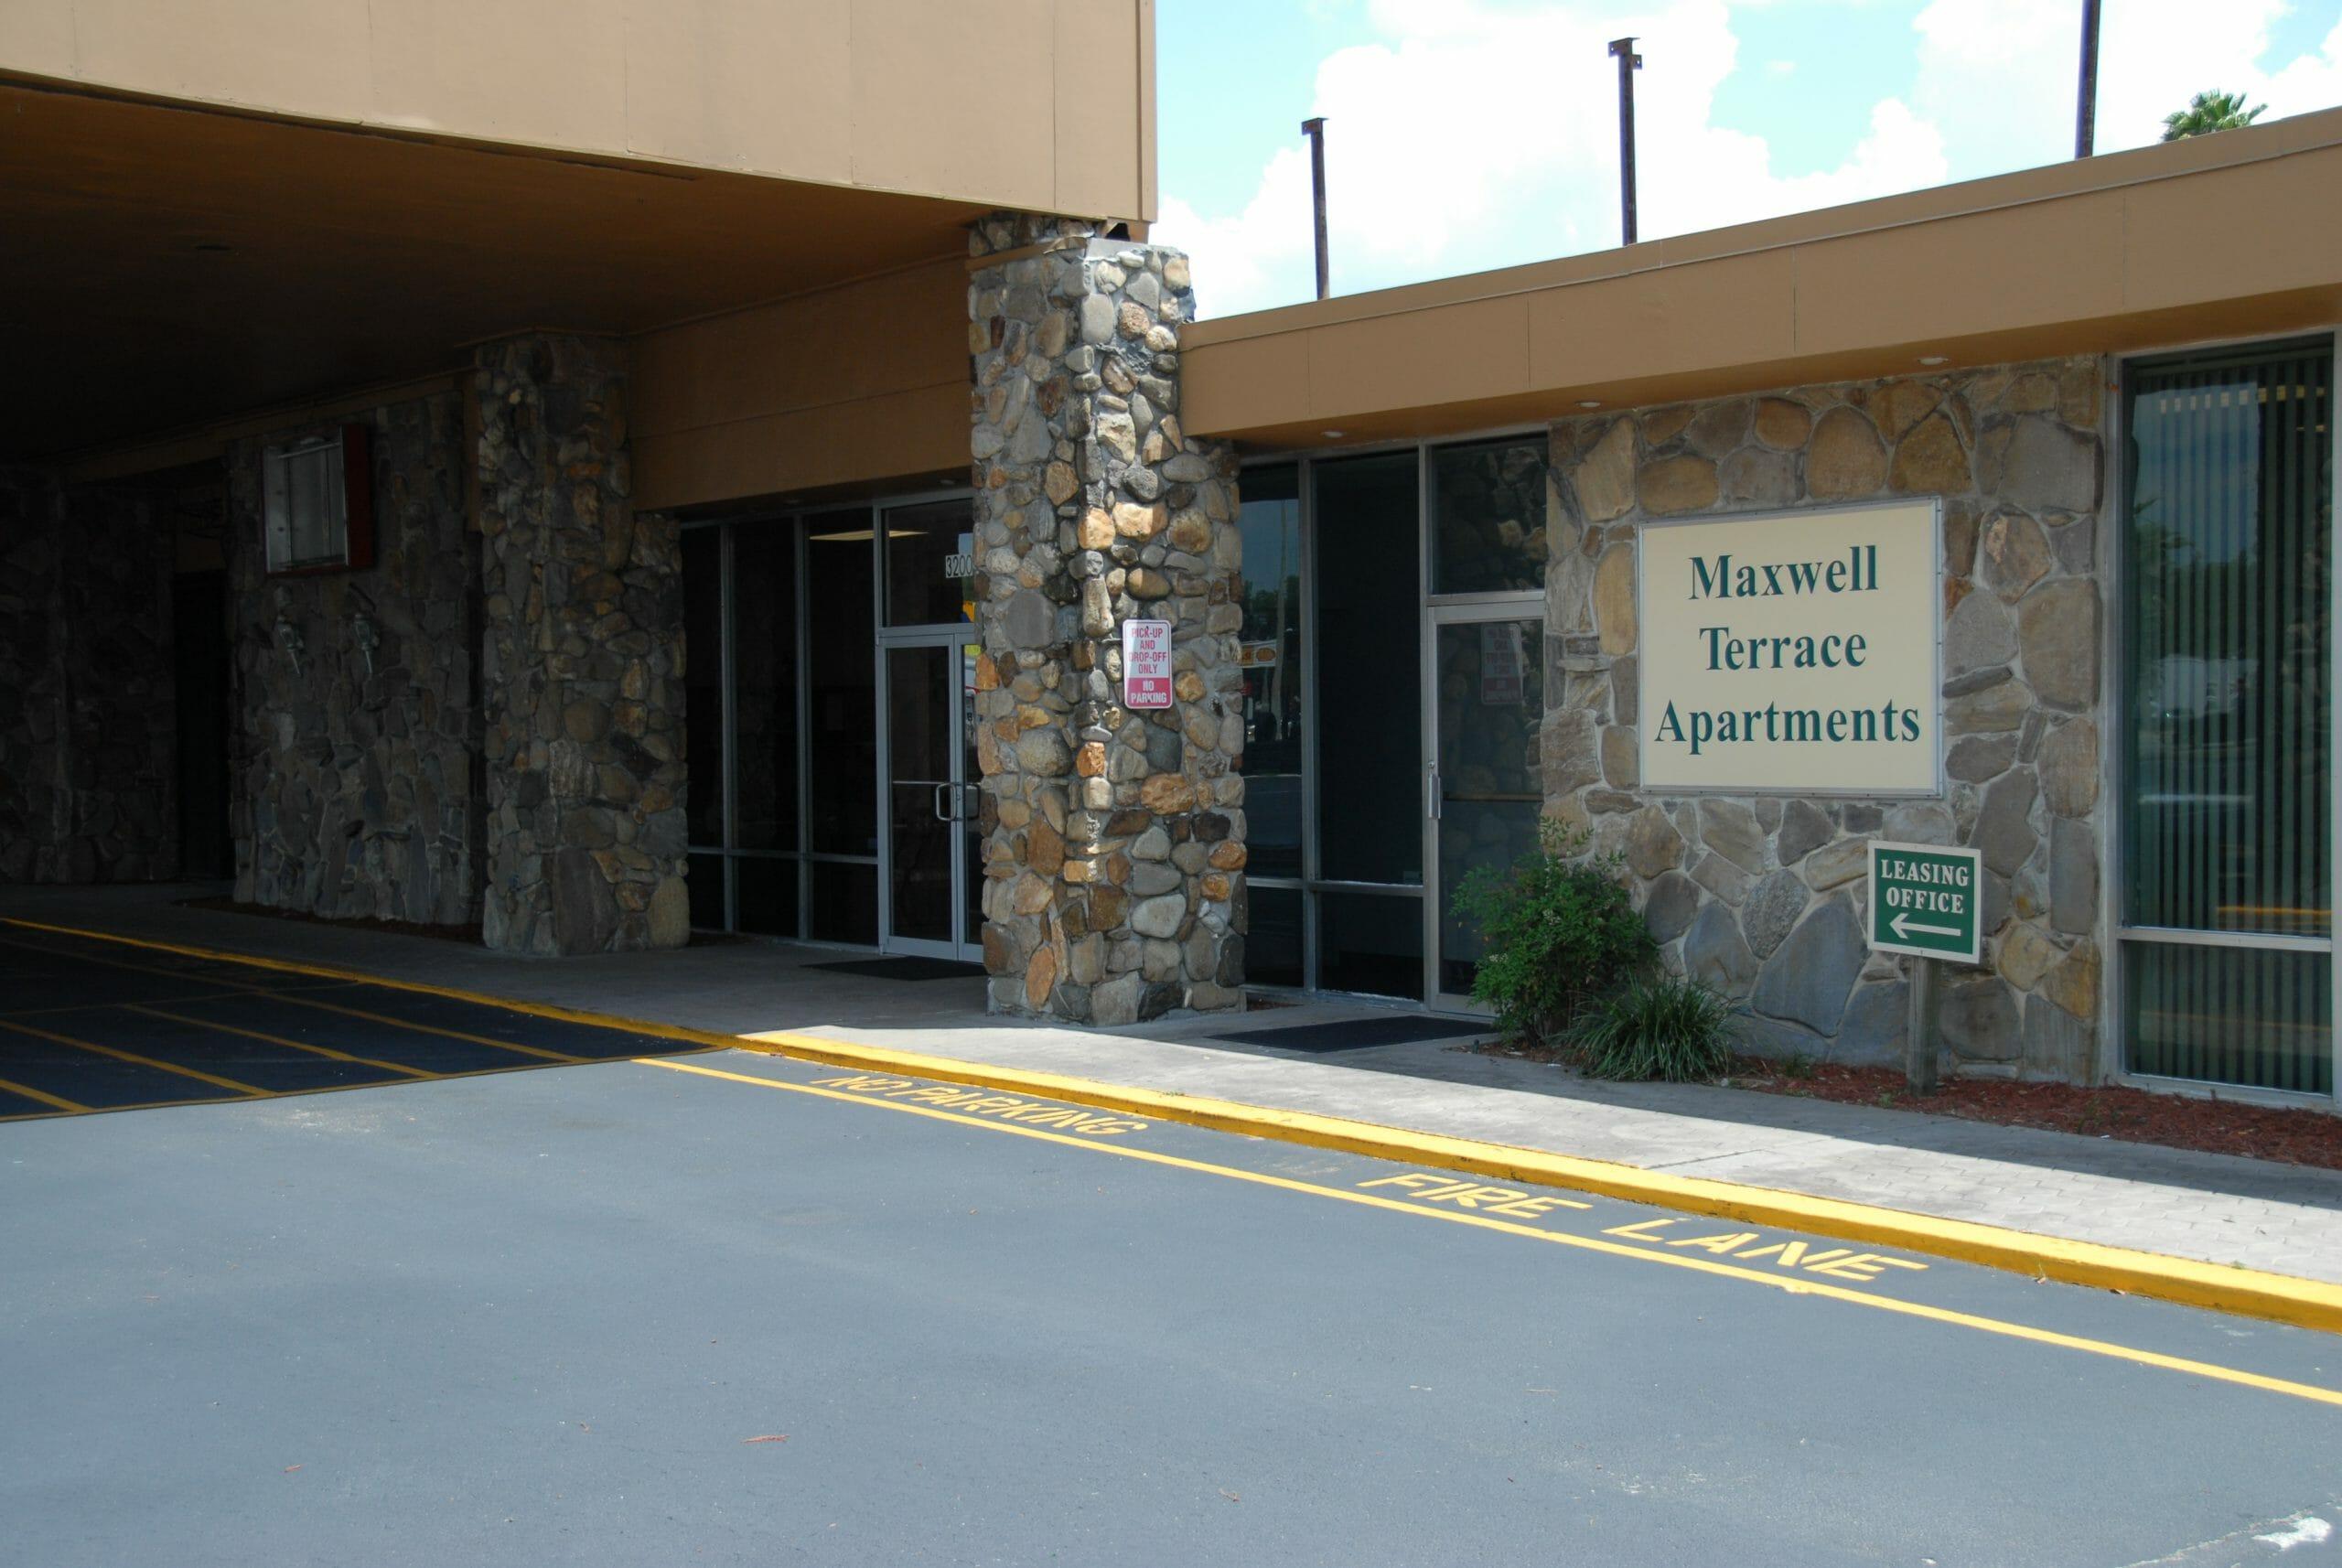 Exterior of Maxwell Terrace Apartments